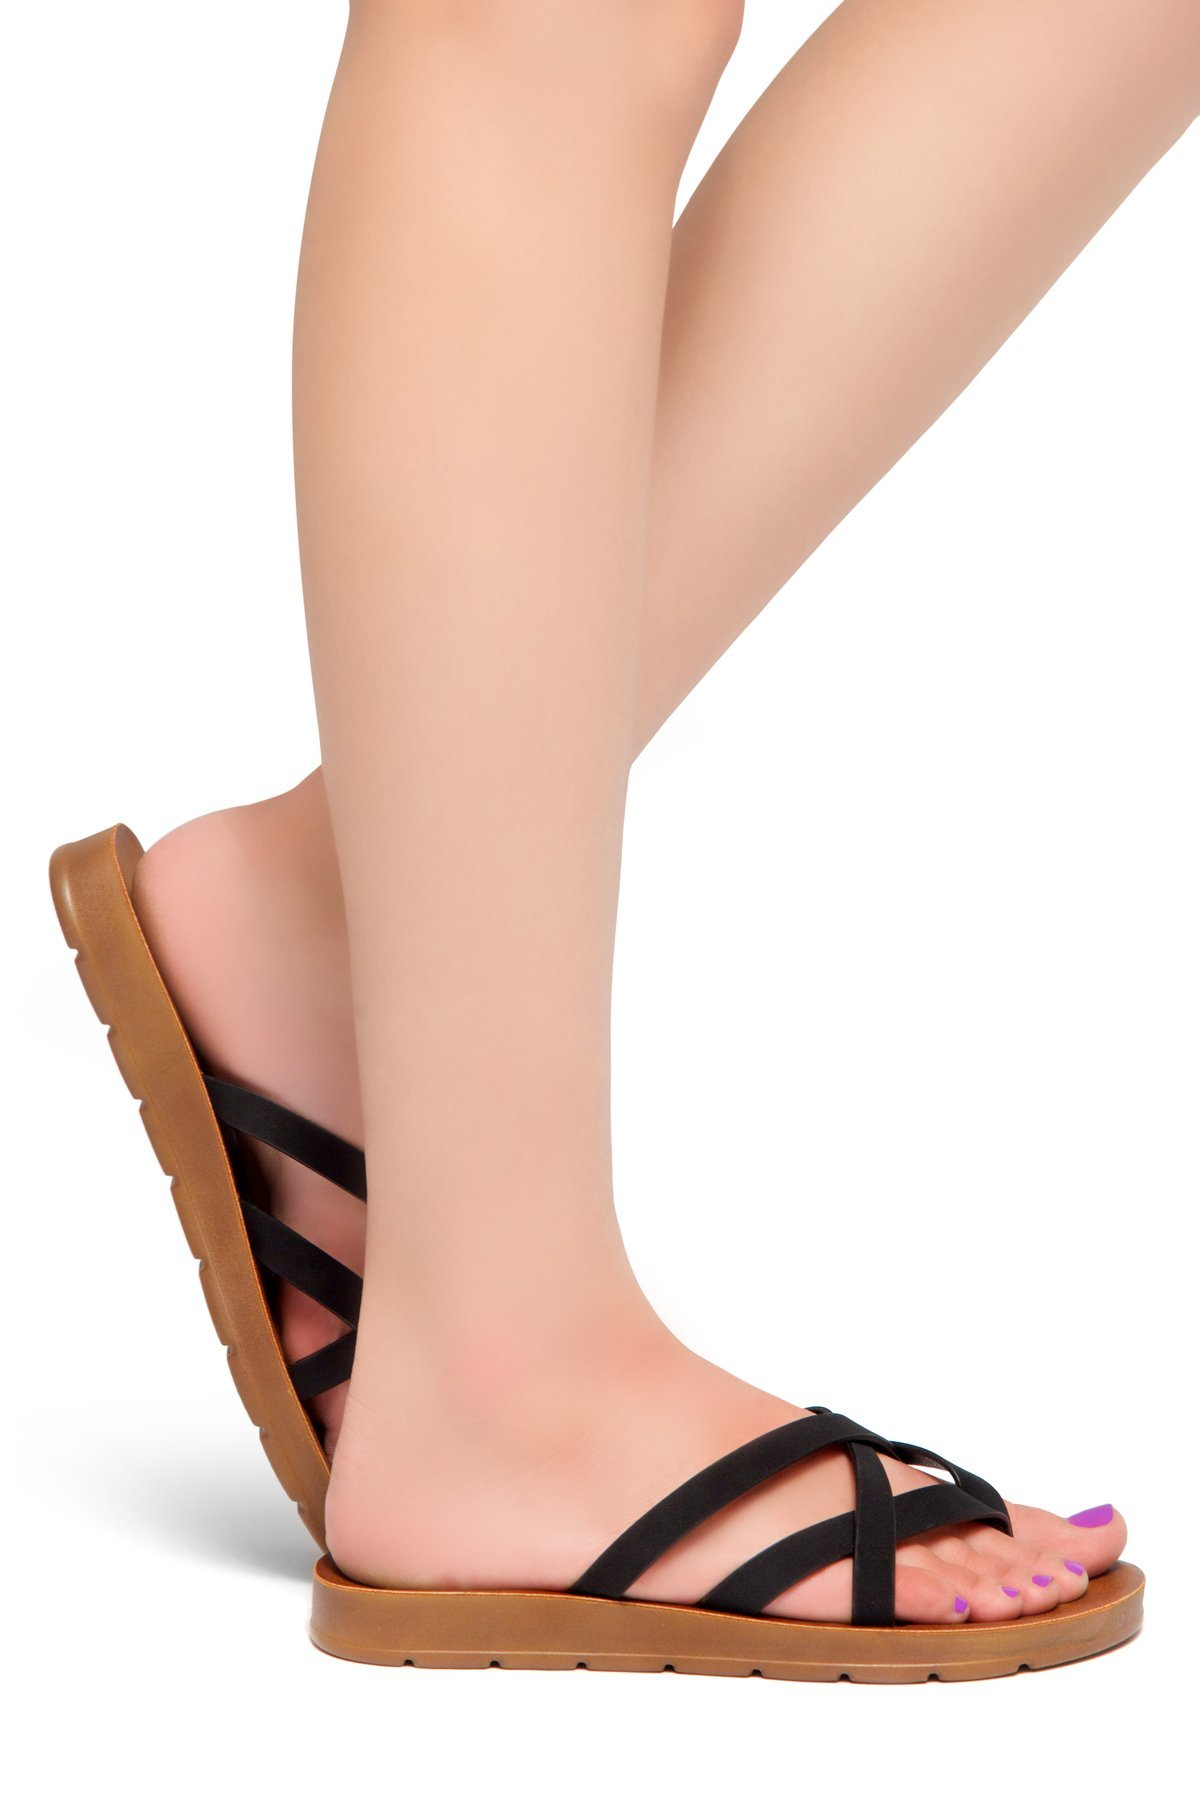 Herstyle Women's Radiate Flat Thong Sandal Black 8.0